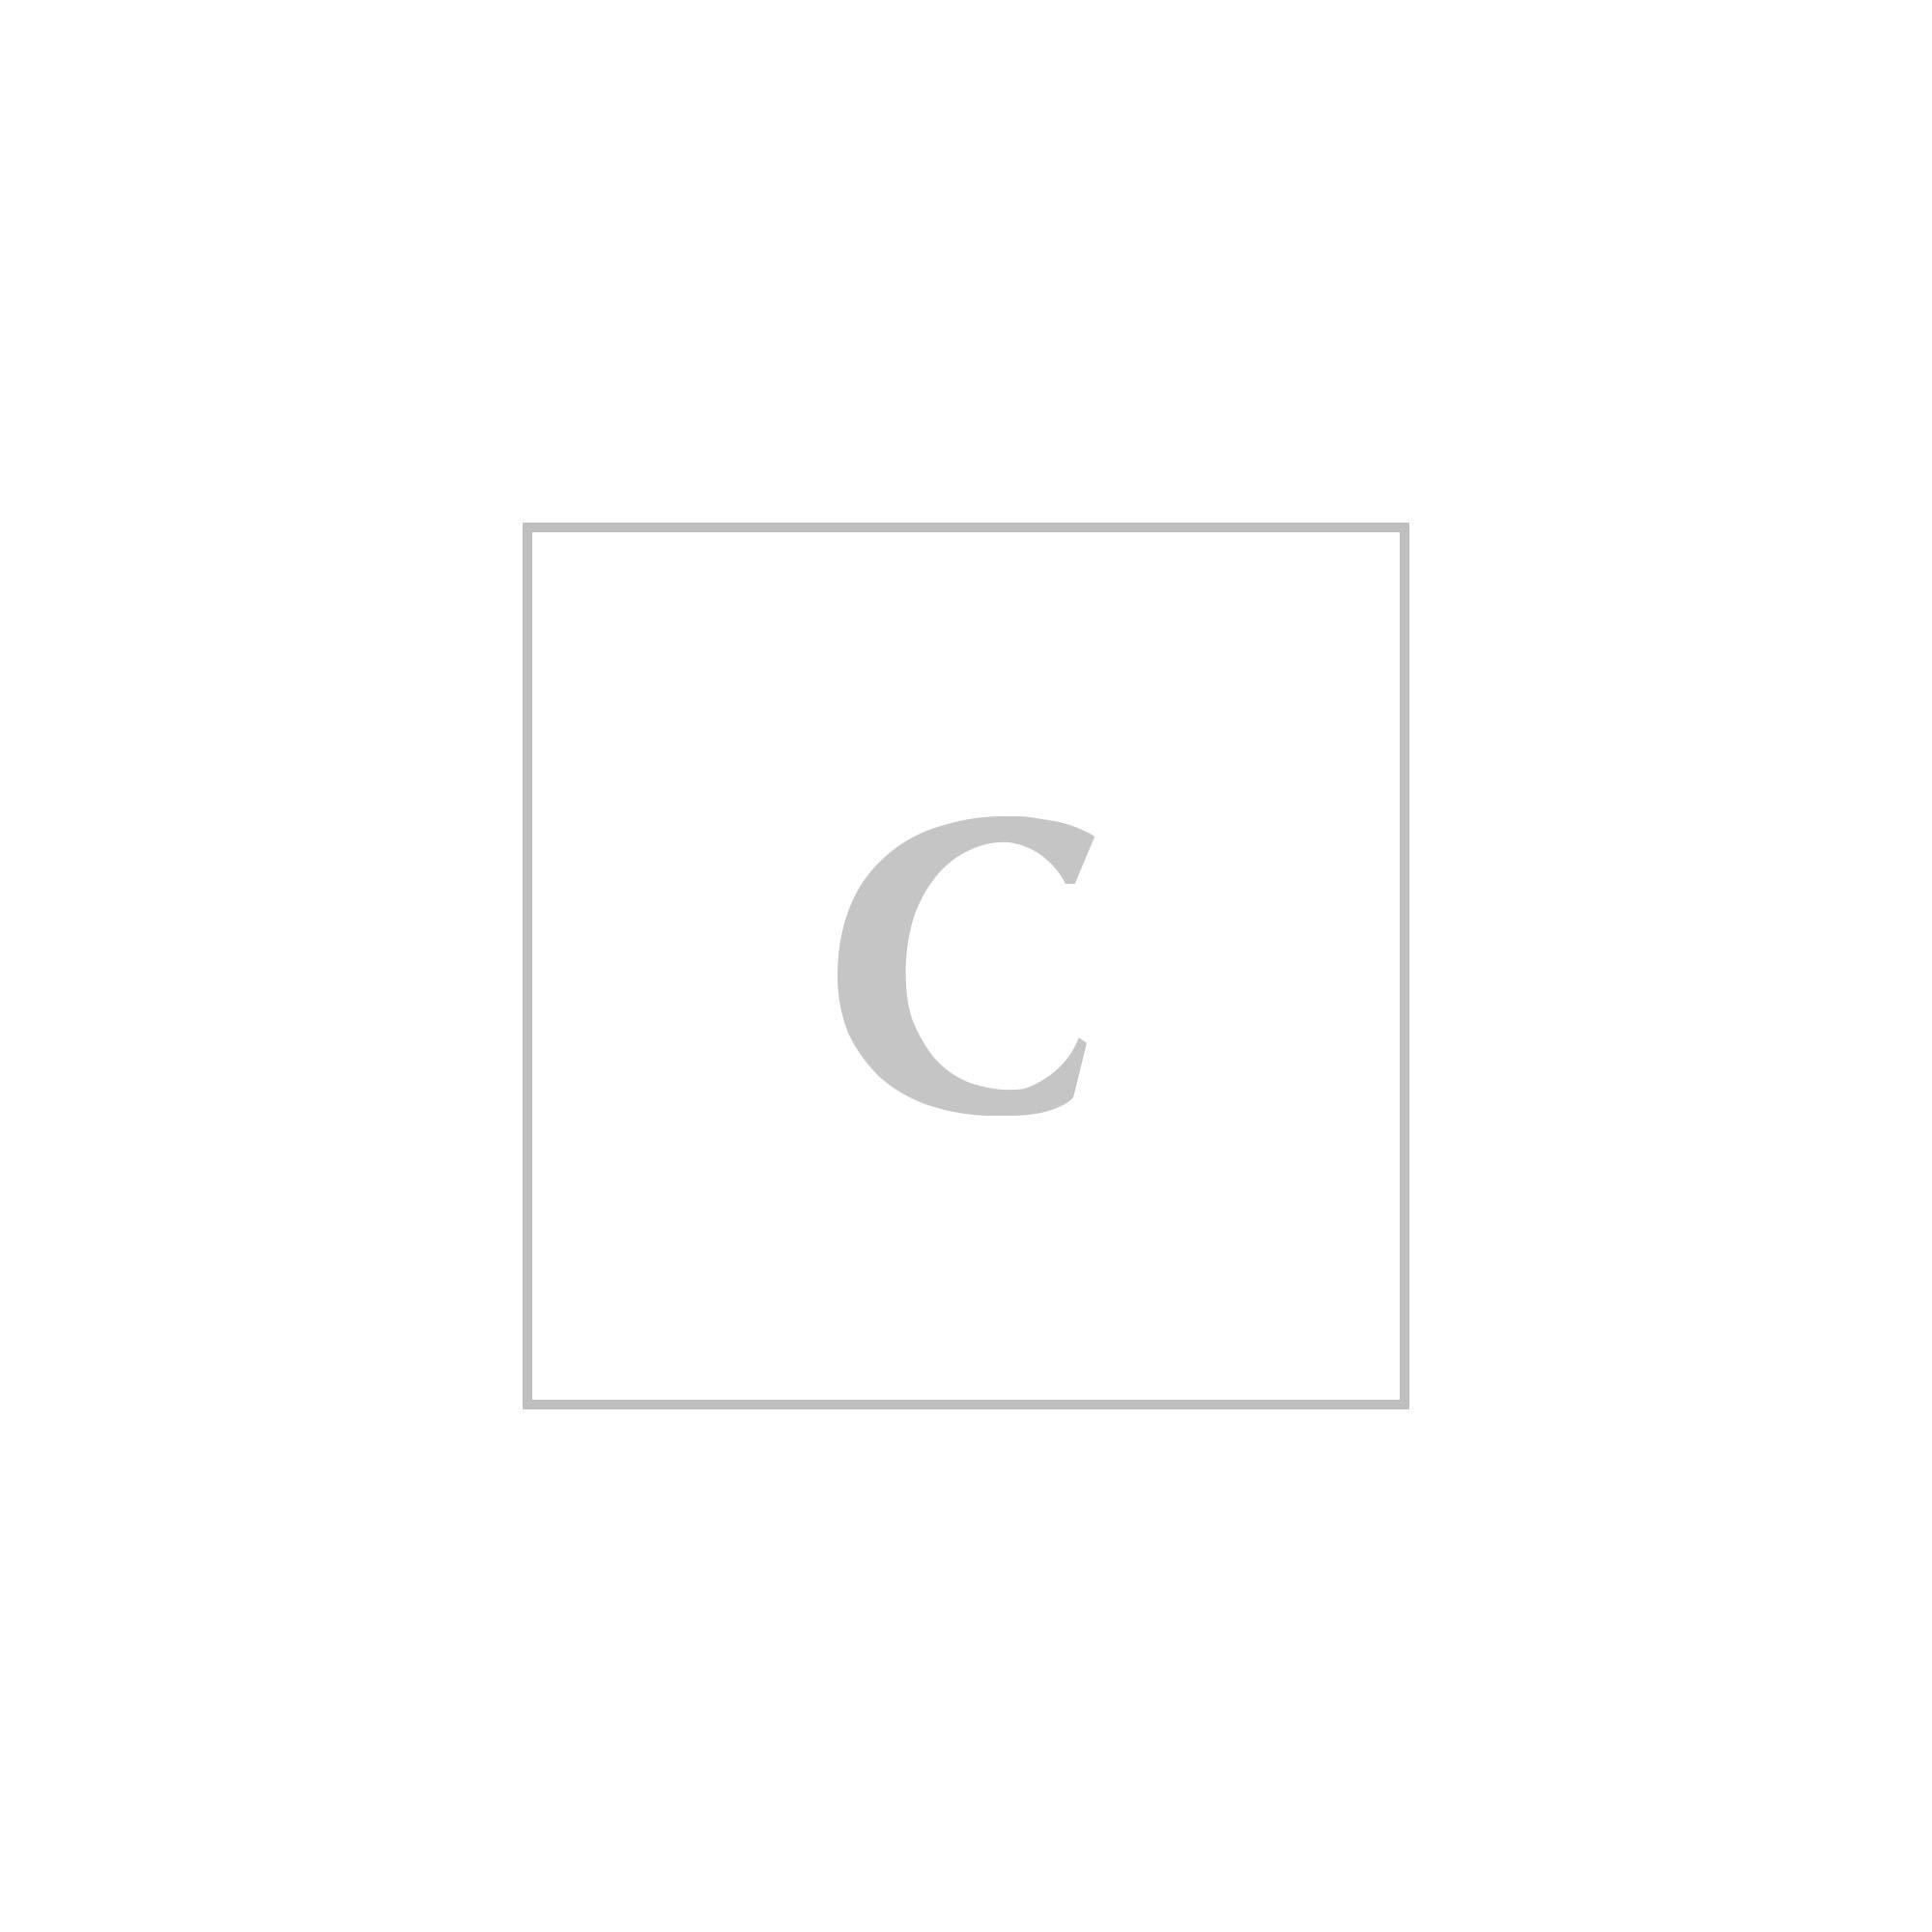 t-shirt cotone cut-out abbigliamento donna